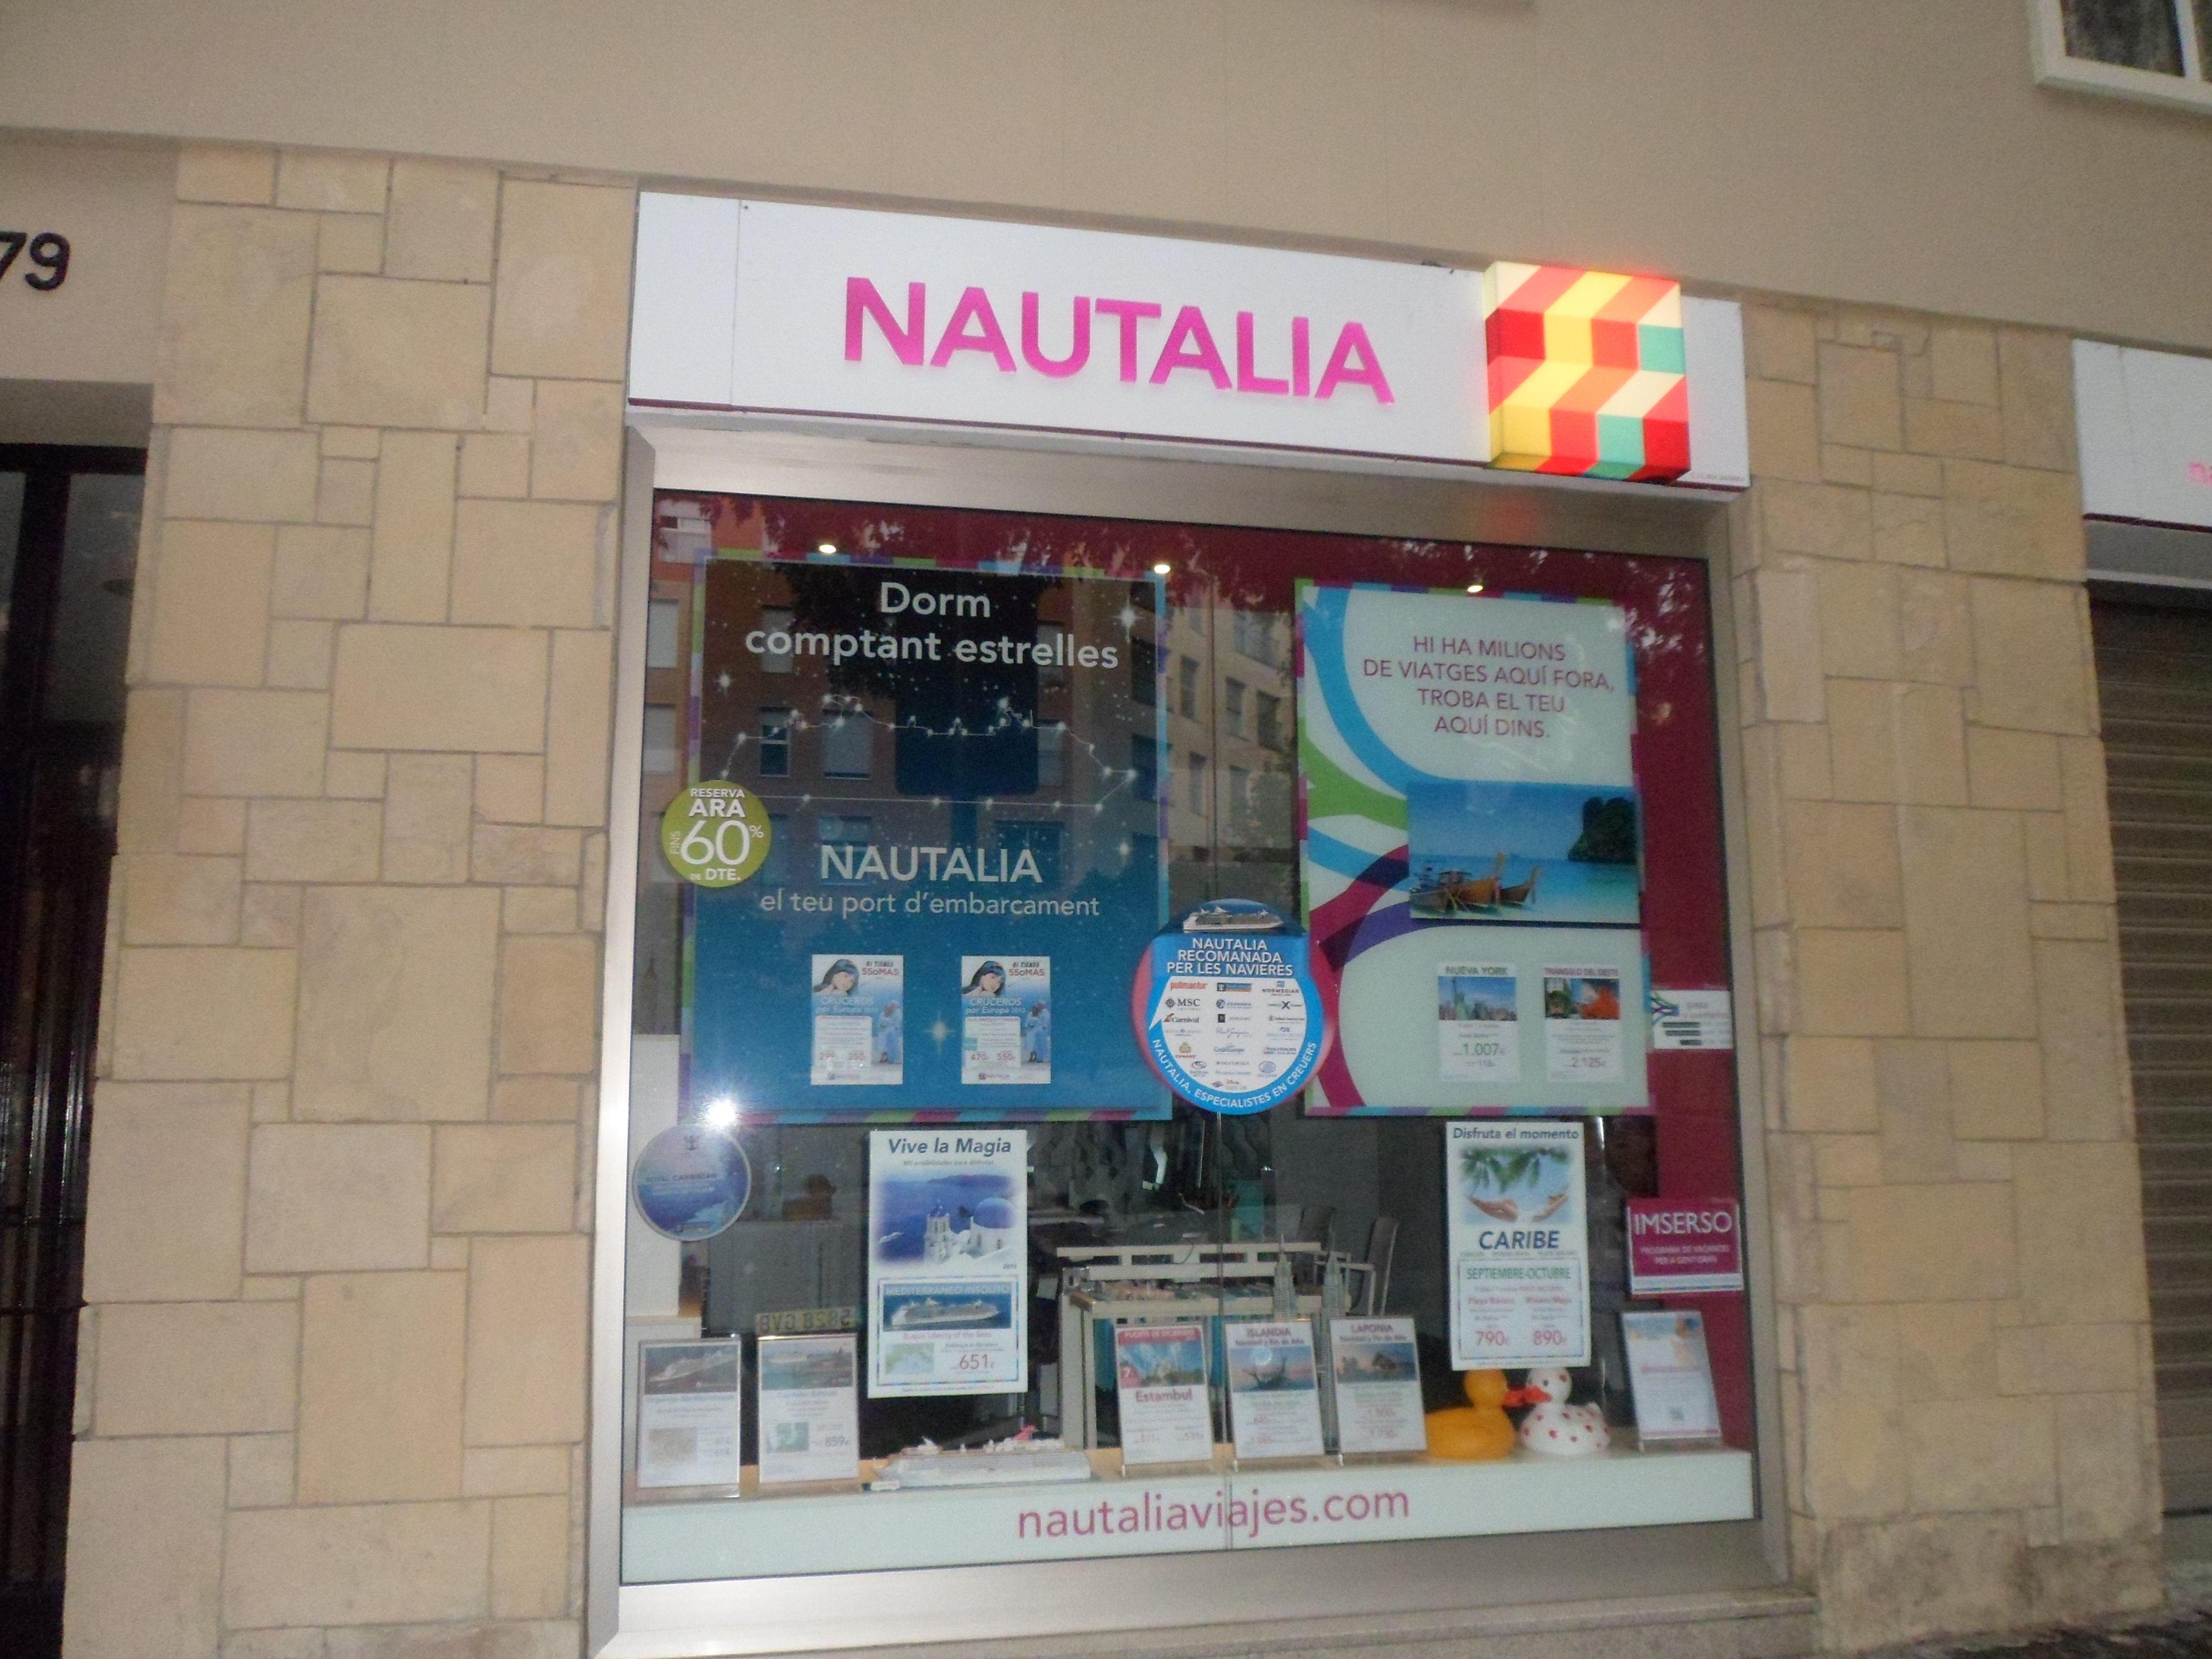 Agencia de viajes nautalia calle proven a barcelona - Calle montserrat barcelona ...